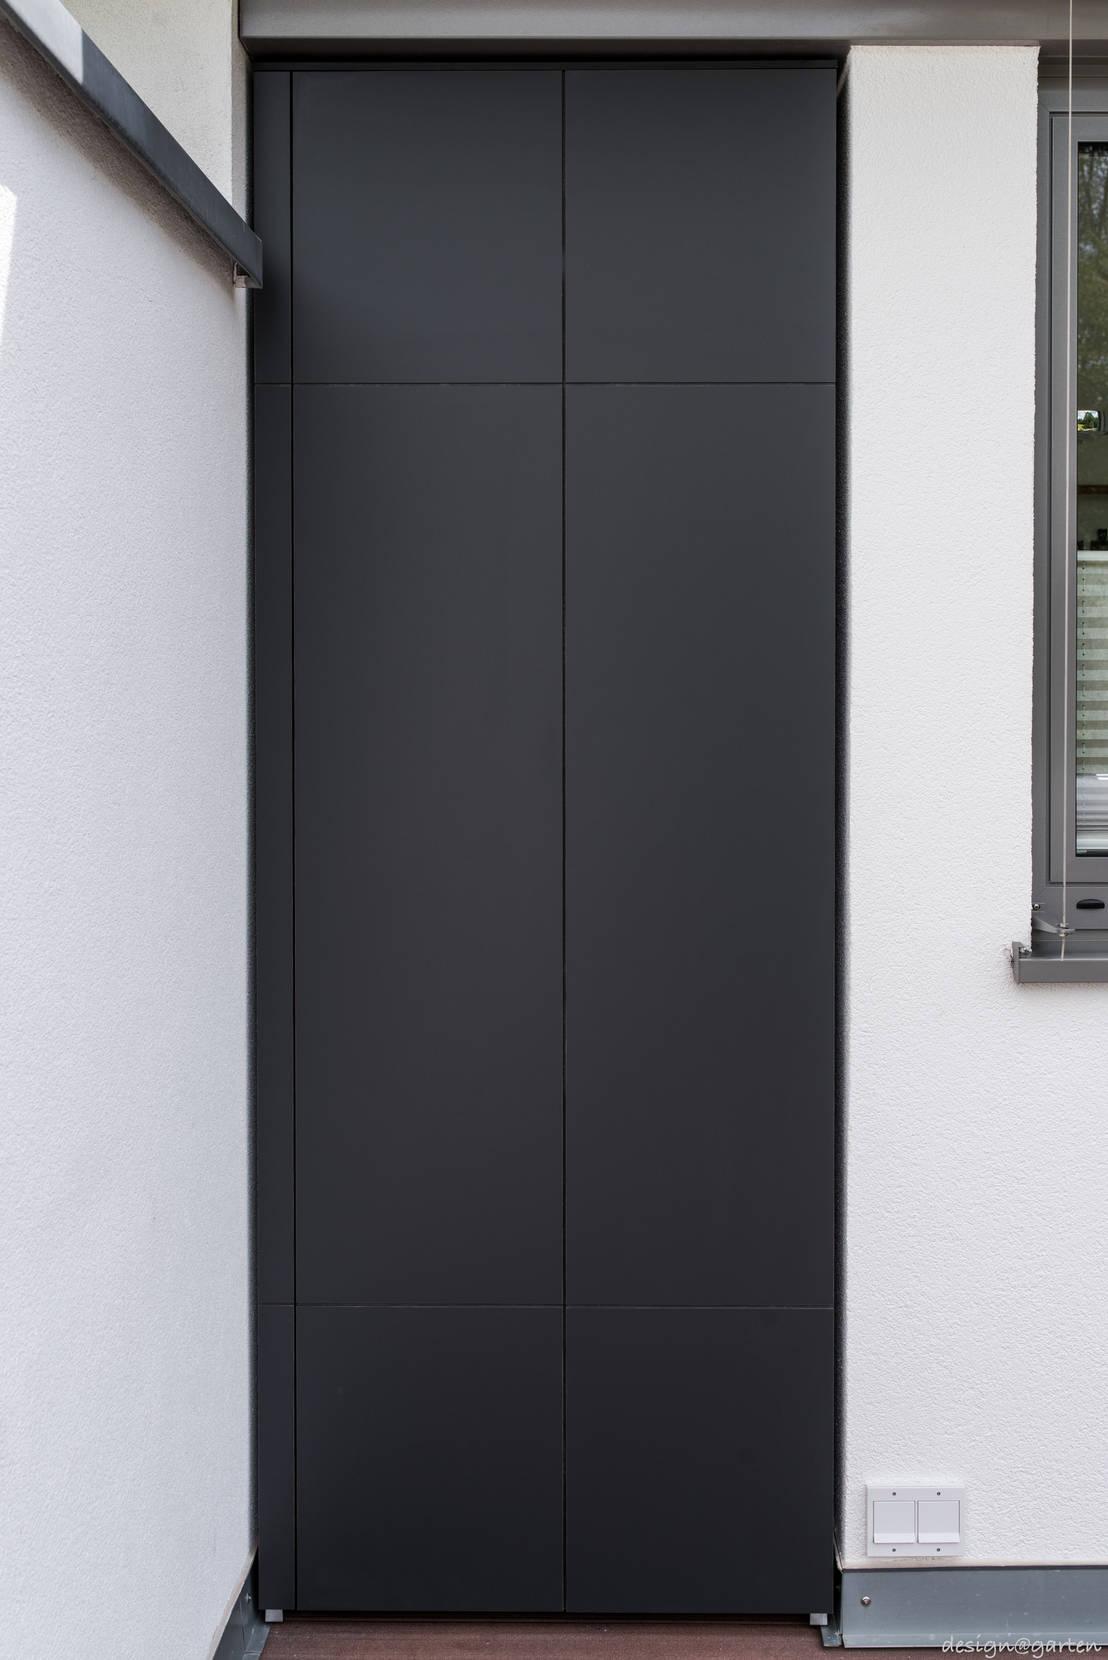 terrassenschrank win nach ma wetterfest by design garten homify. Black Bedroom Furniture Sets. Home Design Ideas